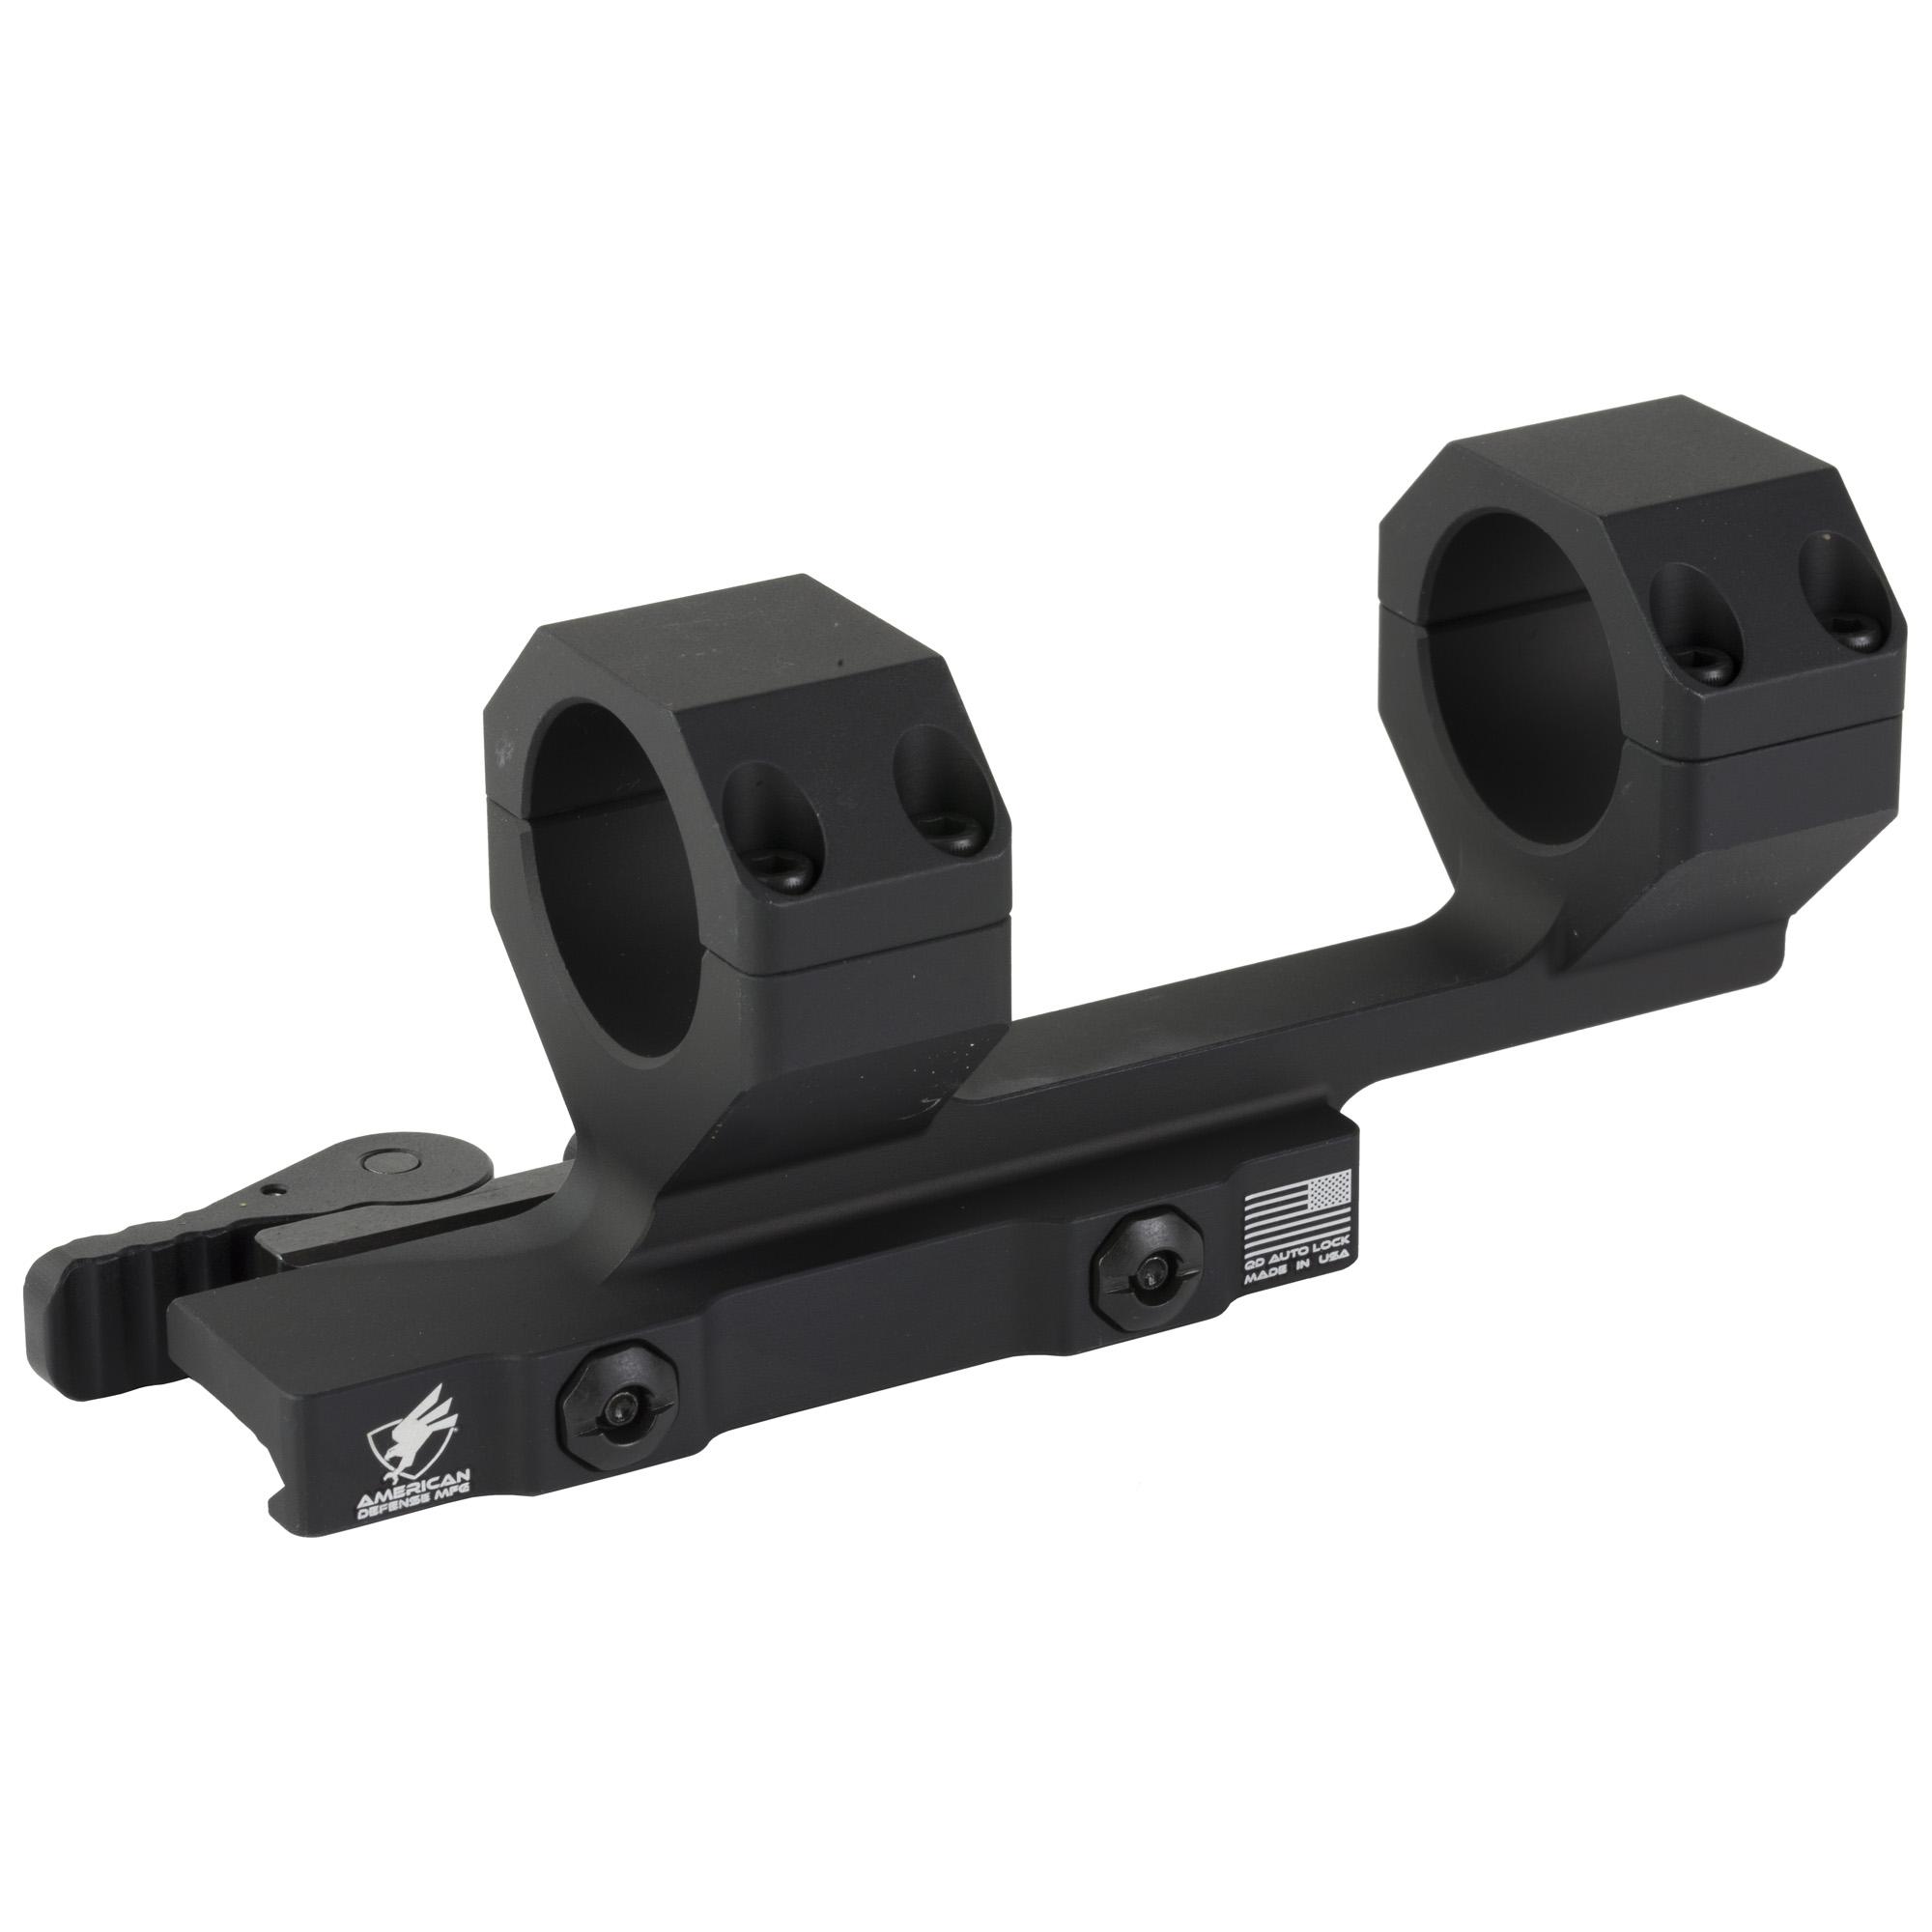 Am Def Ad-delta Scp Mnt 30mm Cantil